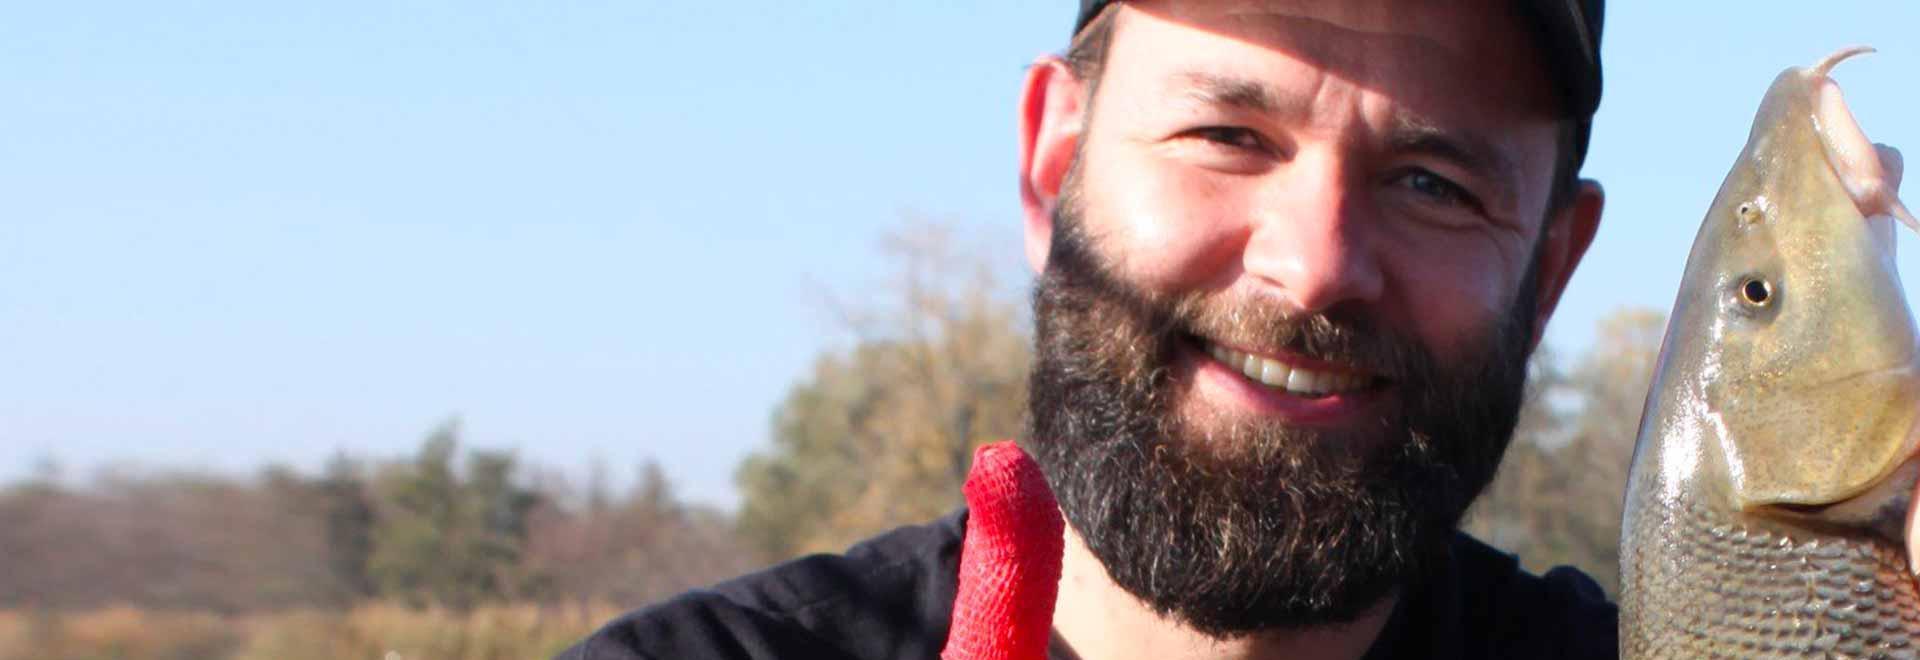 Grossi barbi sul Tevere a Umbertide